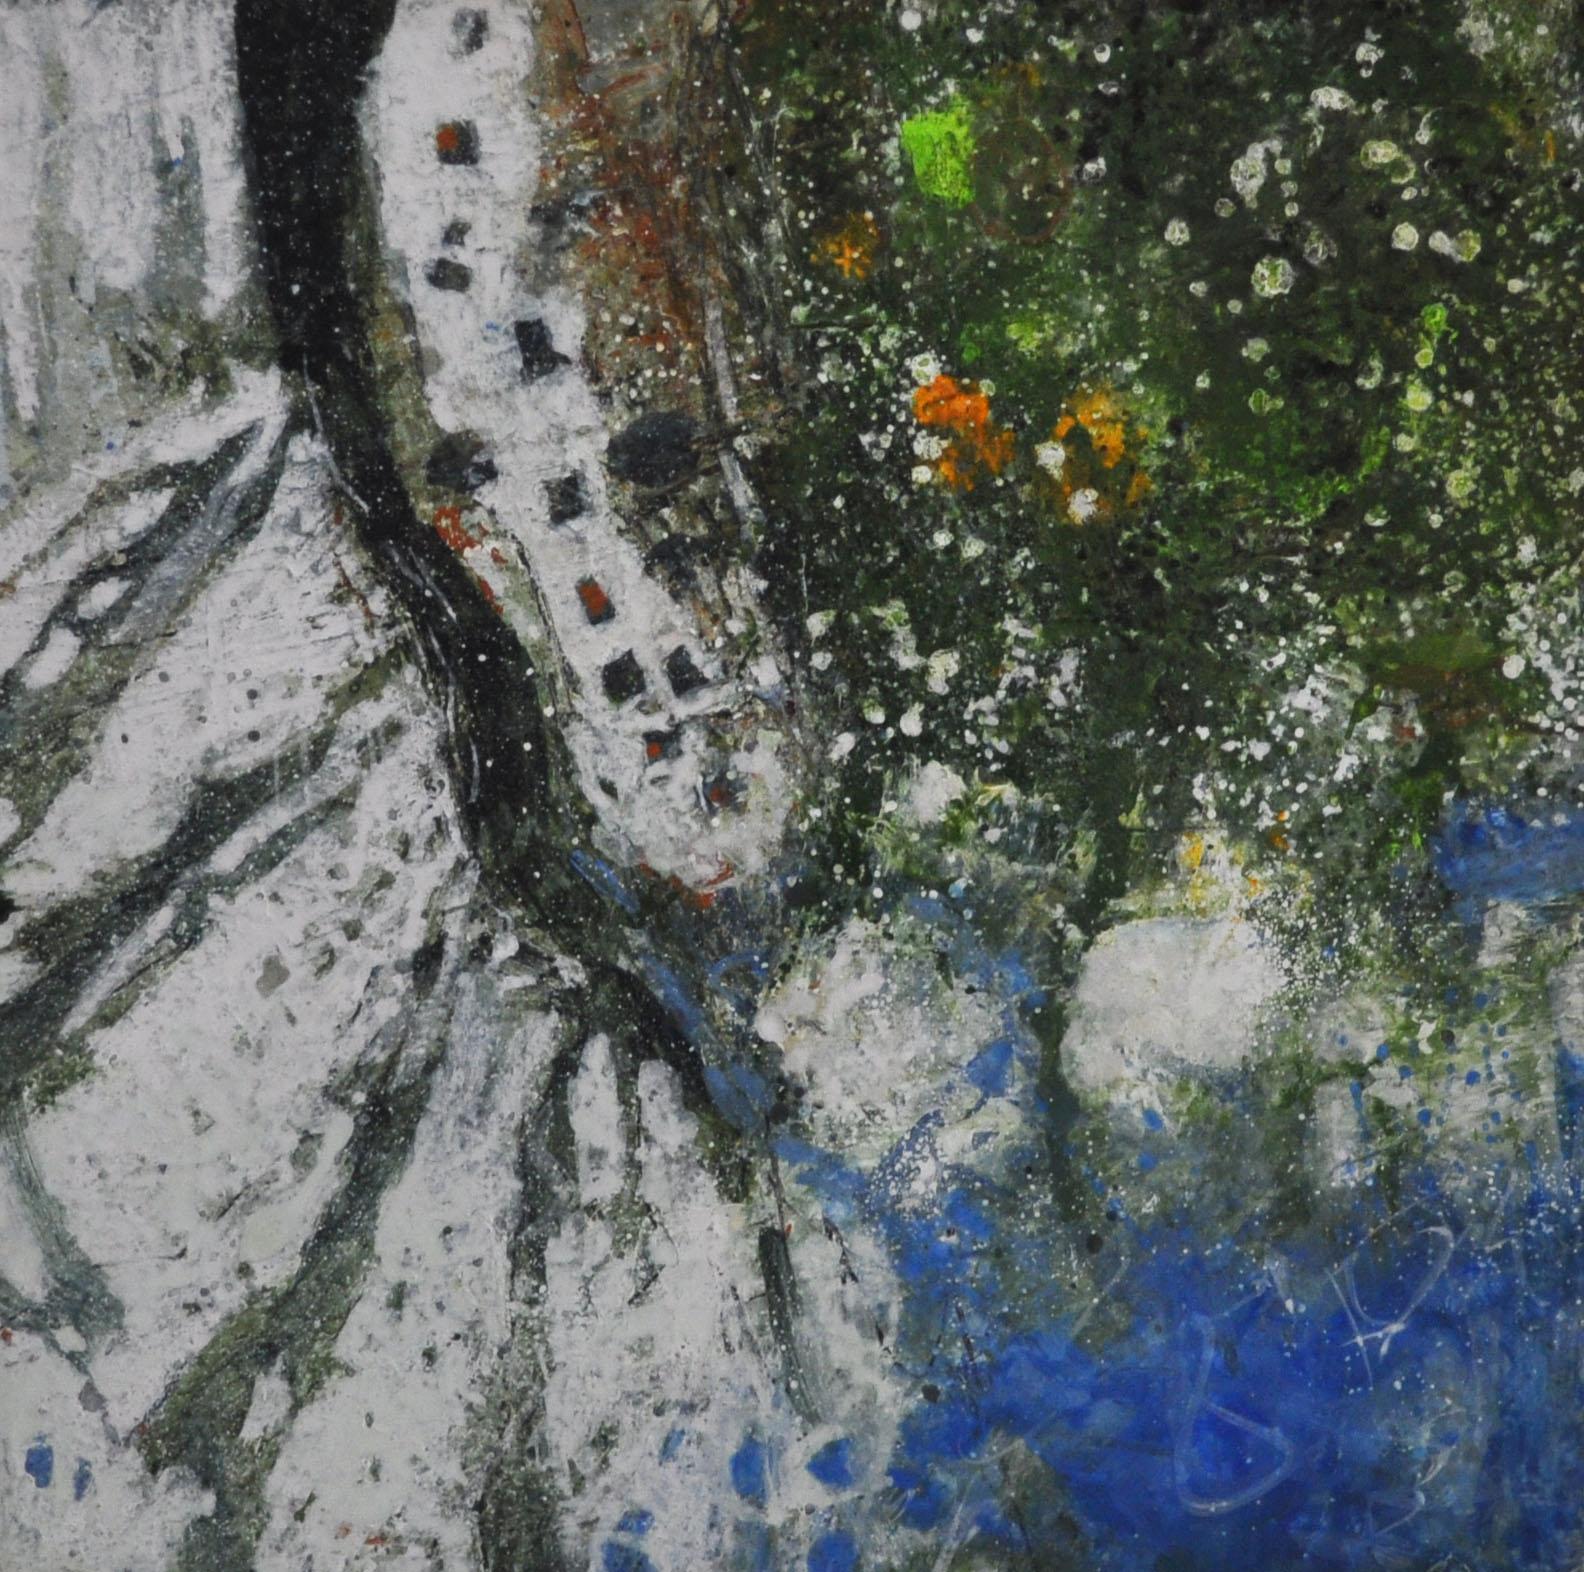 Lewis Noble, Tree Shadows on Limestone Pathway